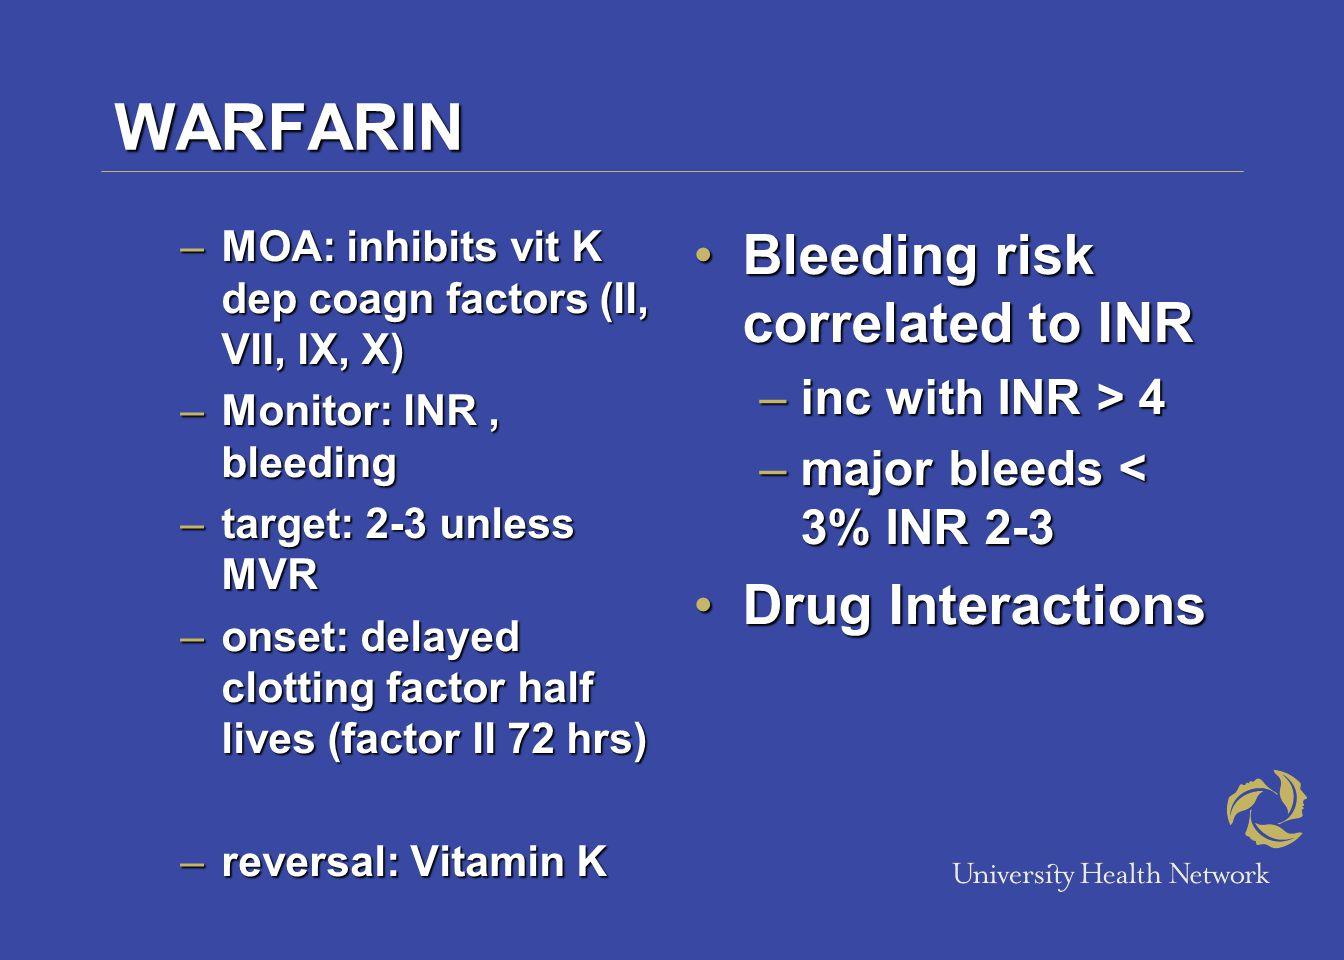 WARFARIN –MOA: inhibits vit K dep coagn factors (II, VII, IX, X) –Monitor: INR, bleeding –target: 2-3 unless MVR –onset: delayed clotting factor half lives (factor II 72 hrs) –reversal: Vitamin K Bleeding risk correlated to INR Bleeding risk correlated to INR –inc with INR > 4 –major bleeds < 3% INR 2-3 Drug Interactions Drug Interactions